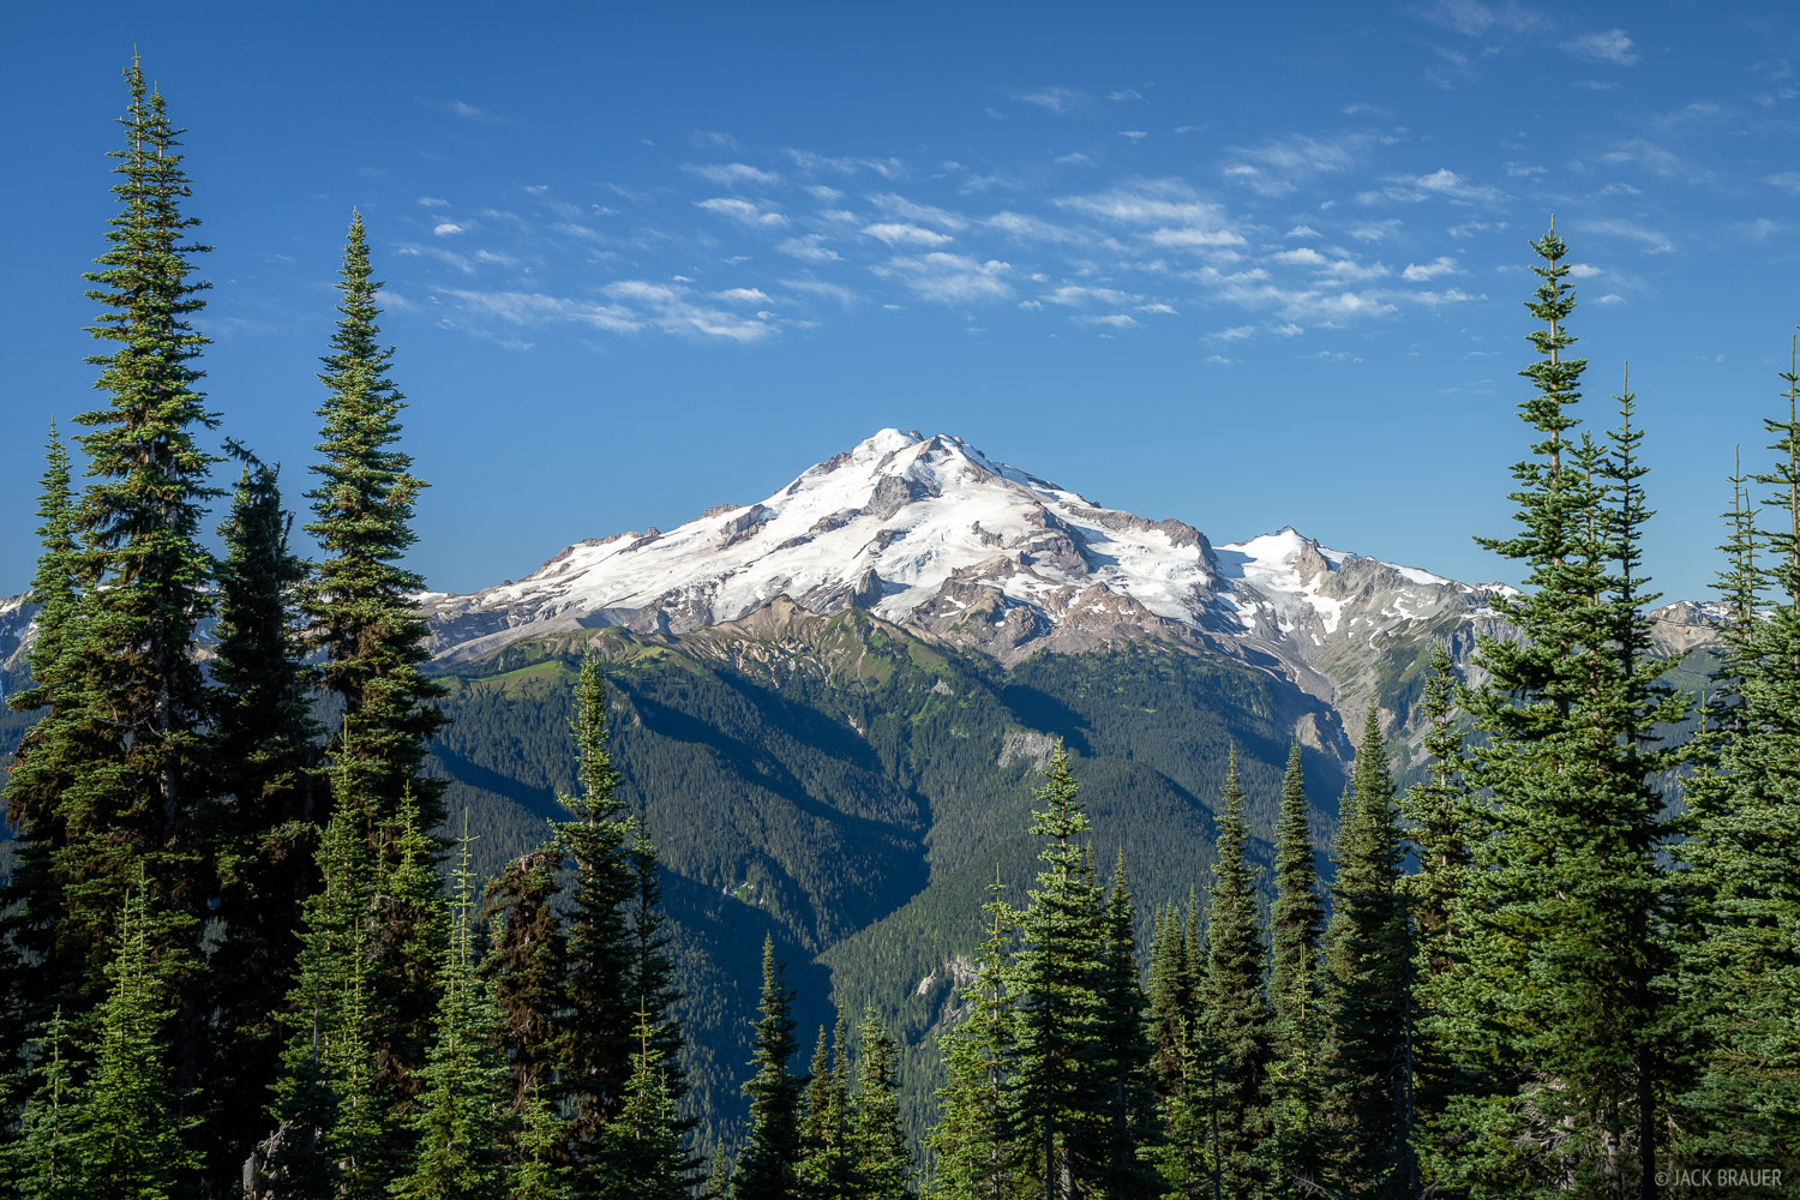 Glacier Peak, Glacier Peak Wilderness, Washington, Cascades, photo